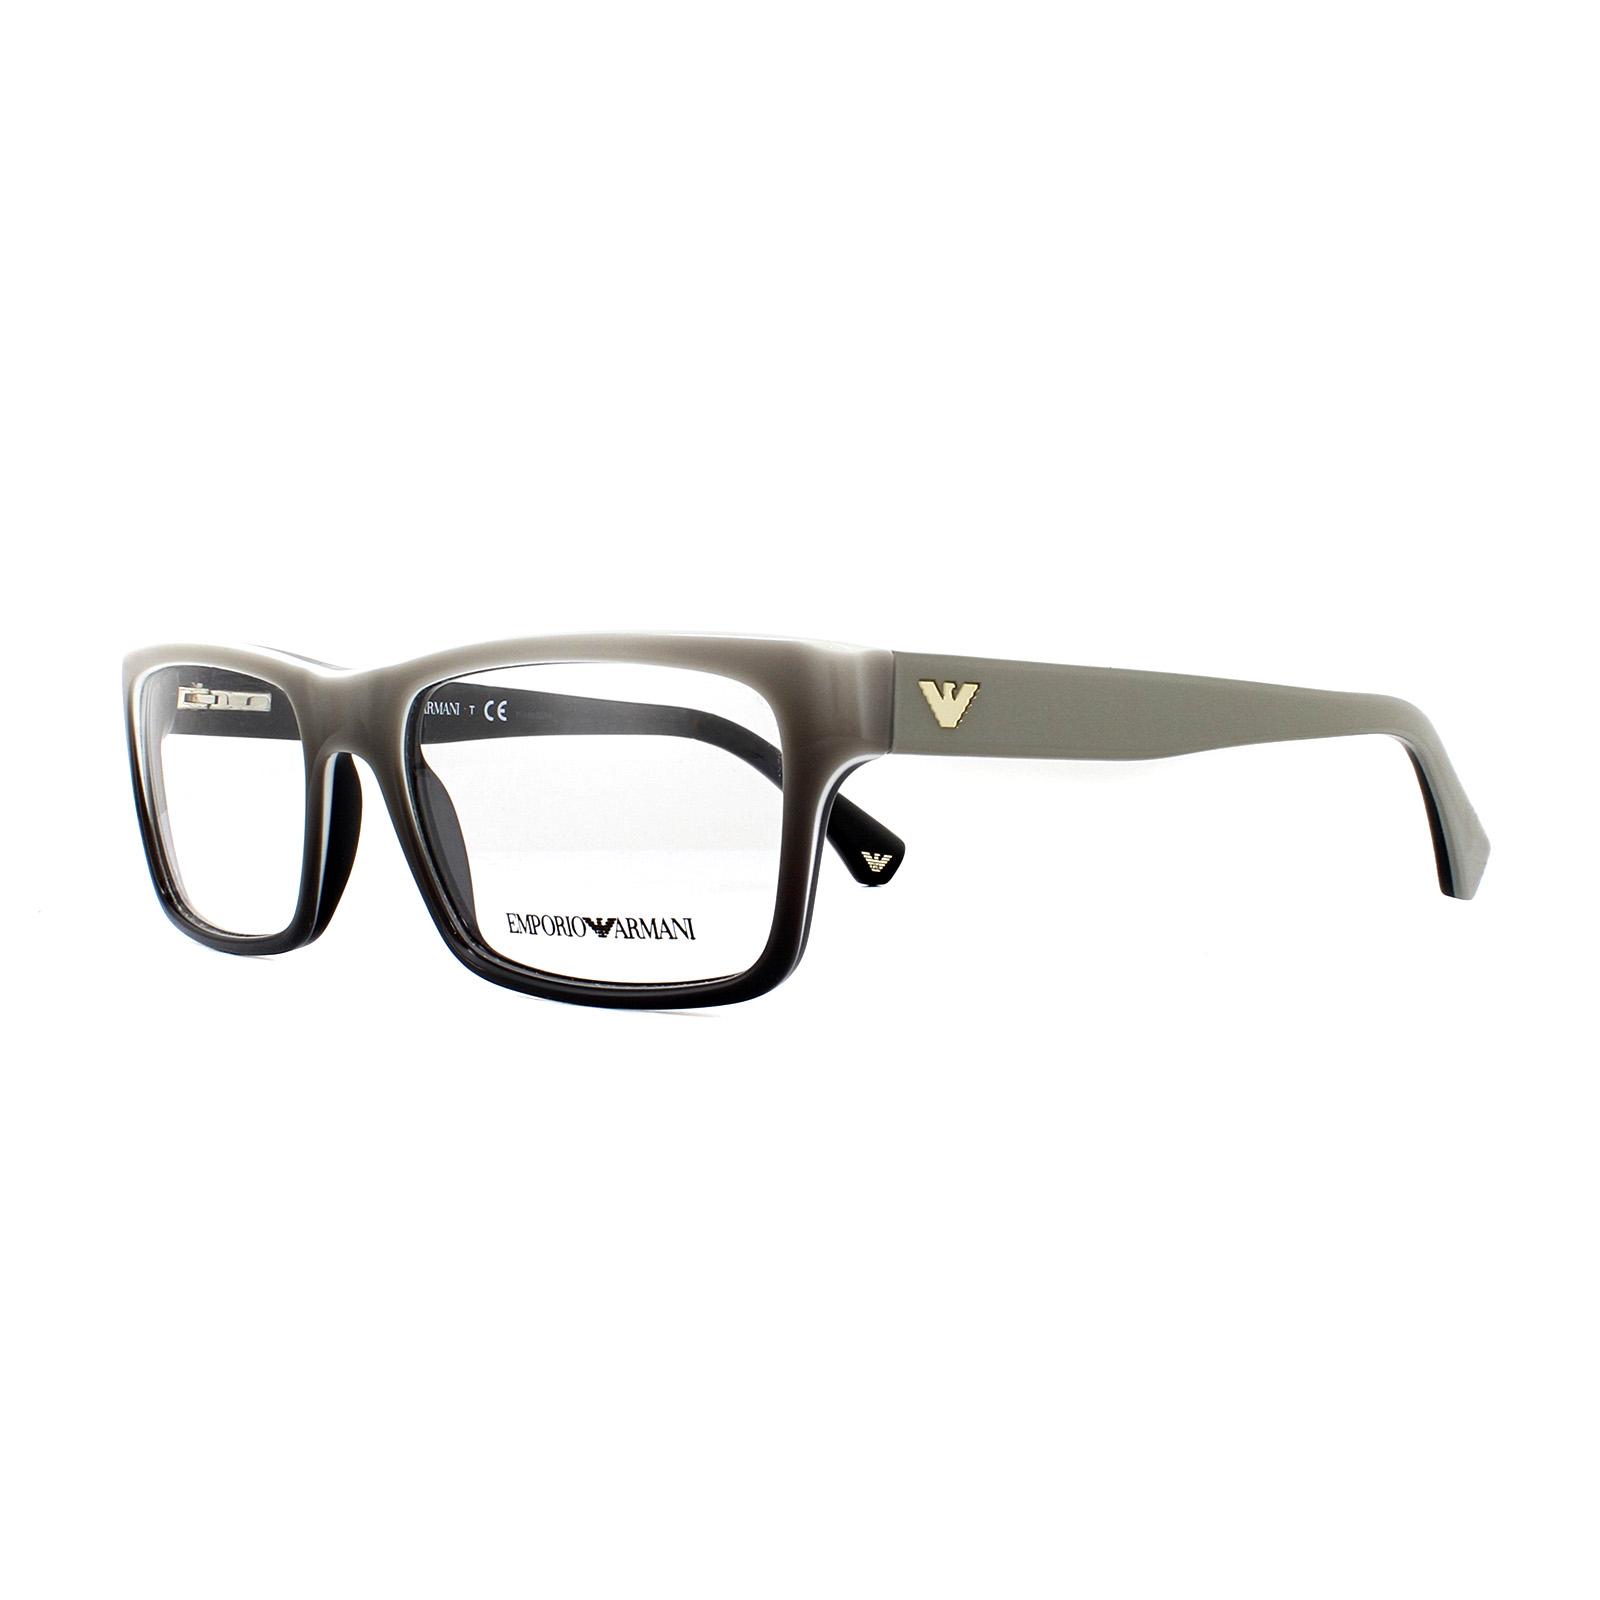 be2adc4dc726 Sentinel Emporio Armani Glasses Frames EA 3050 5346 White Gradient on Black  53mm Mens